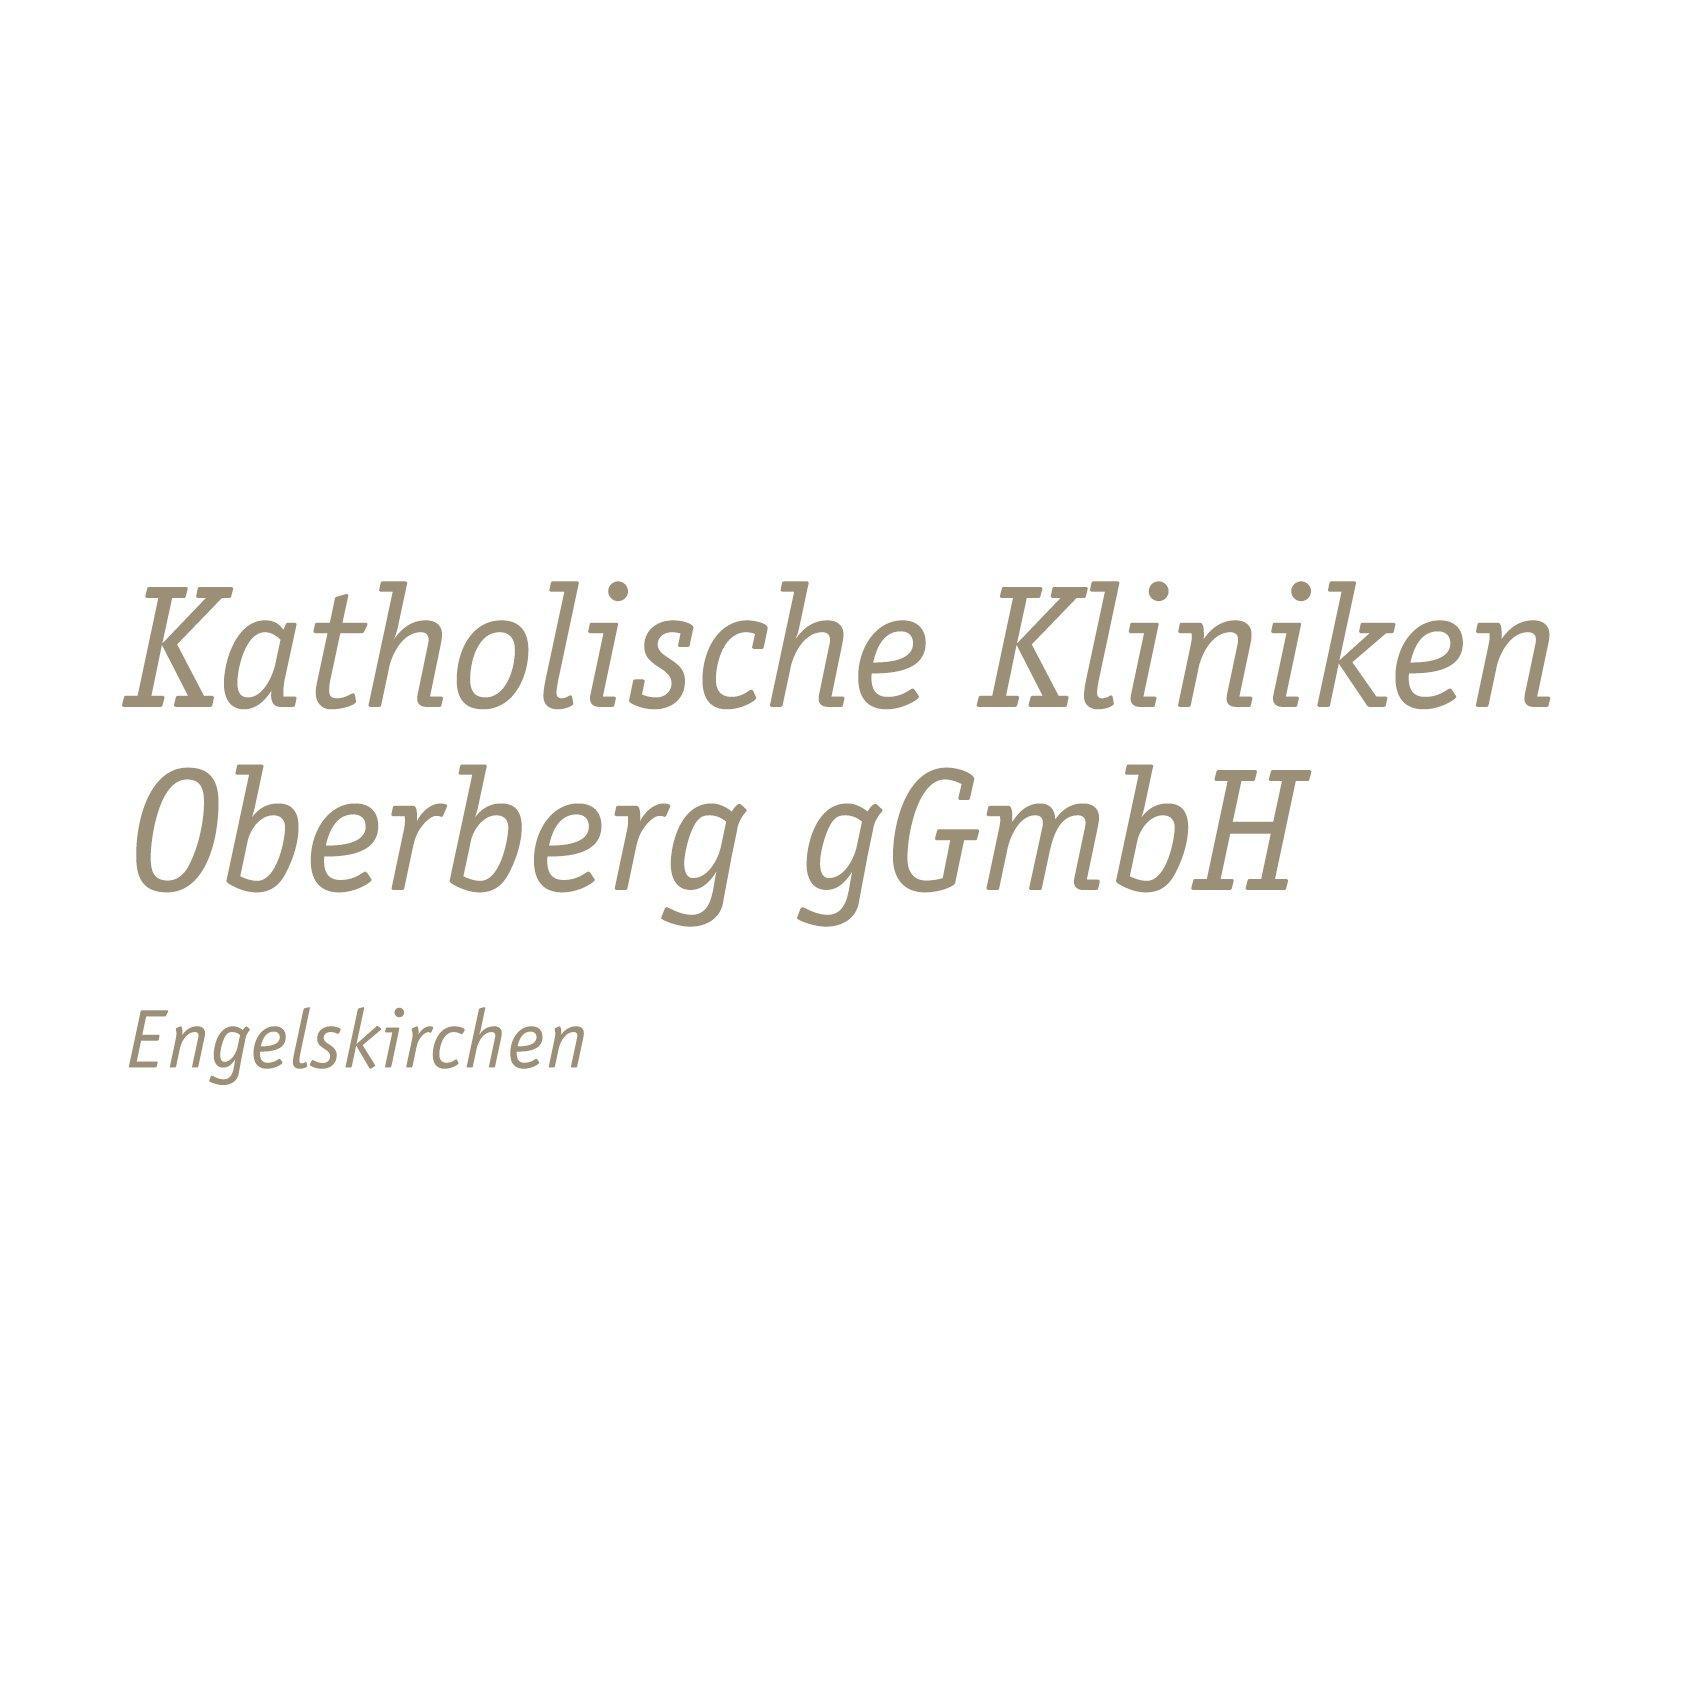 Katholische Kliniken Oberberg  - St. Josef Krankenhaus Engelskirchen